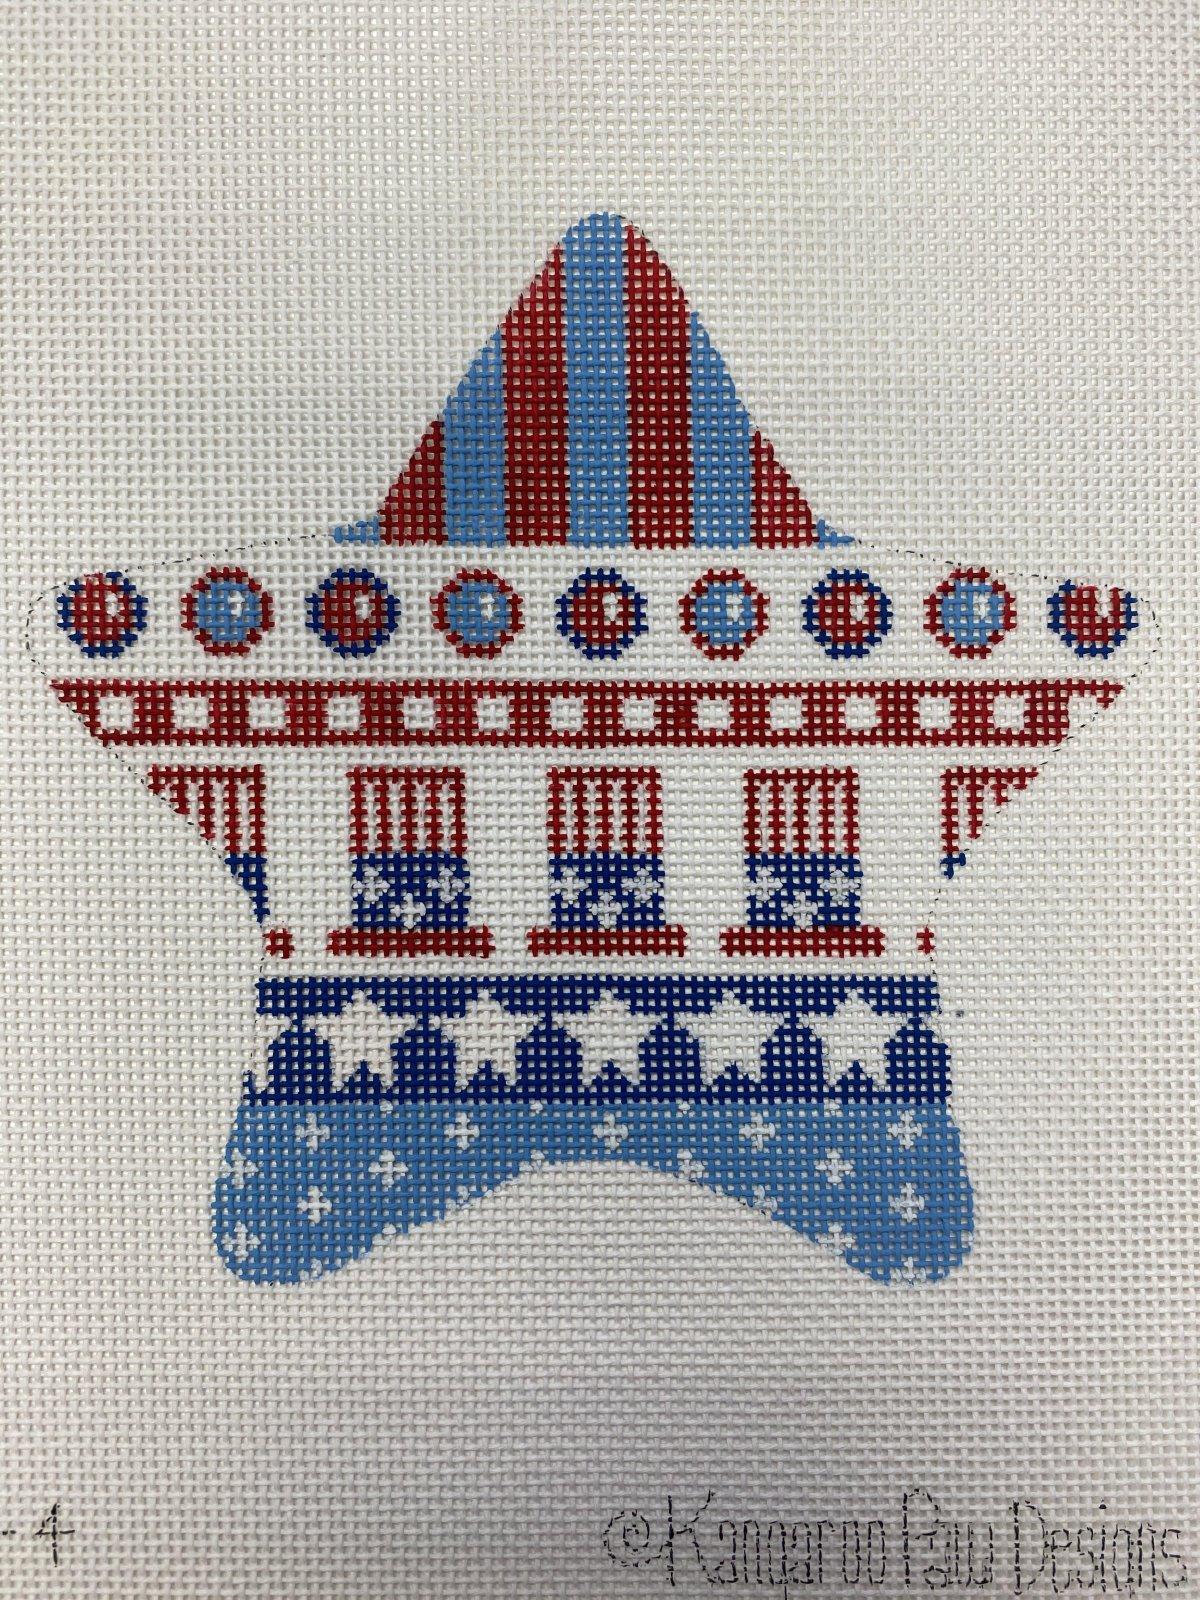 Patriotic Star - Uncle Sams Hat